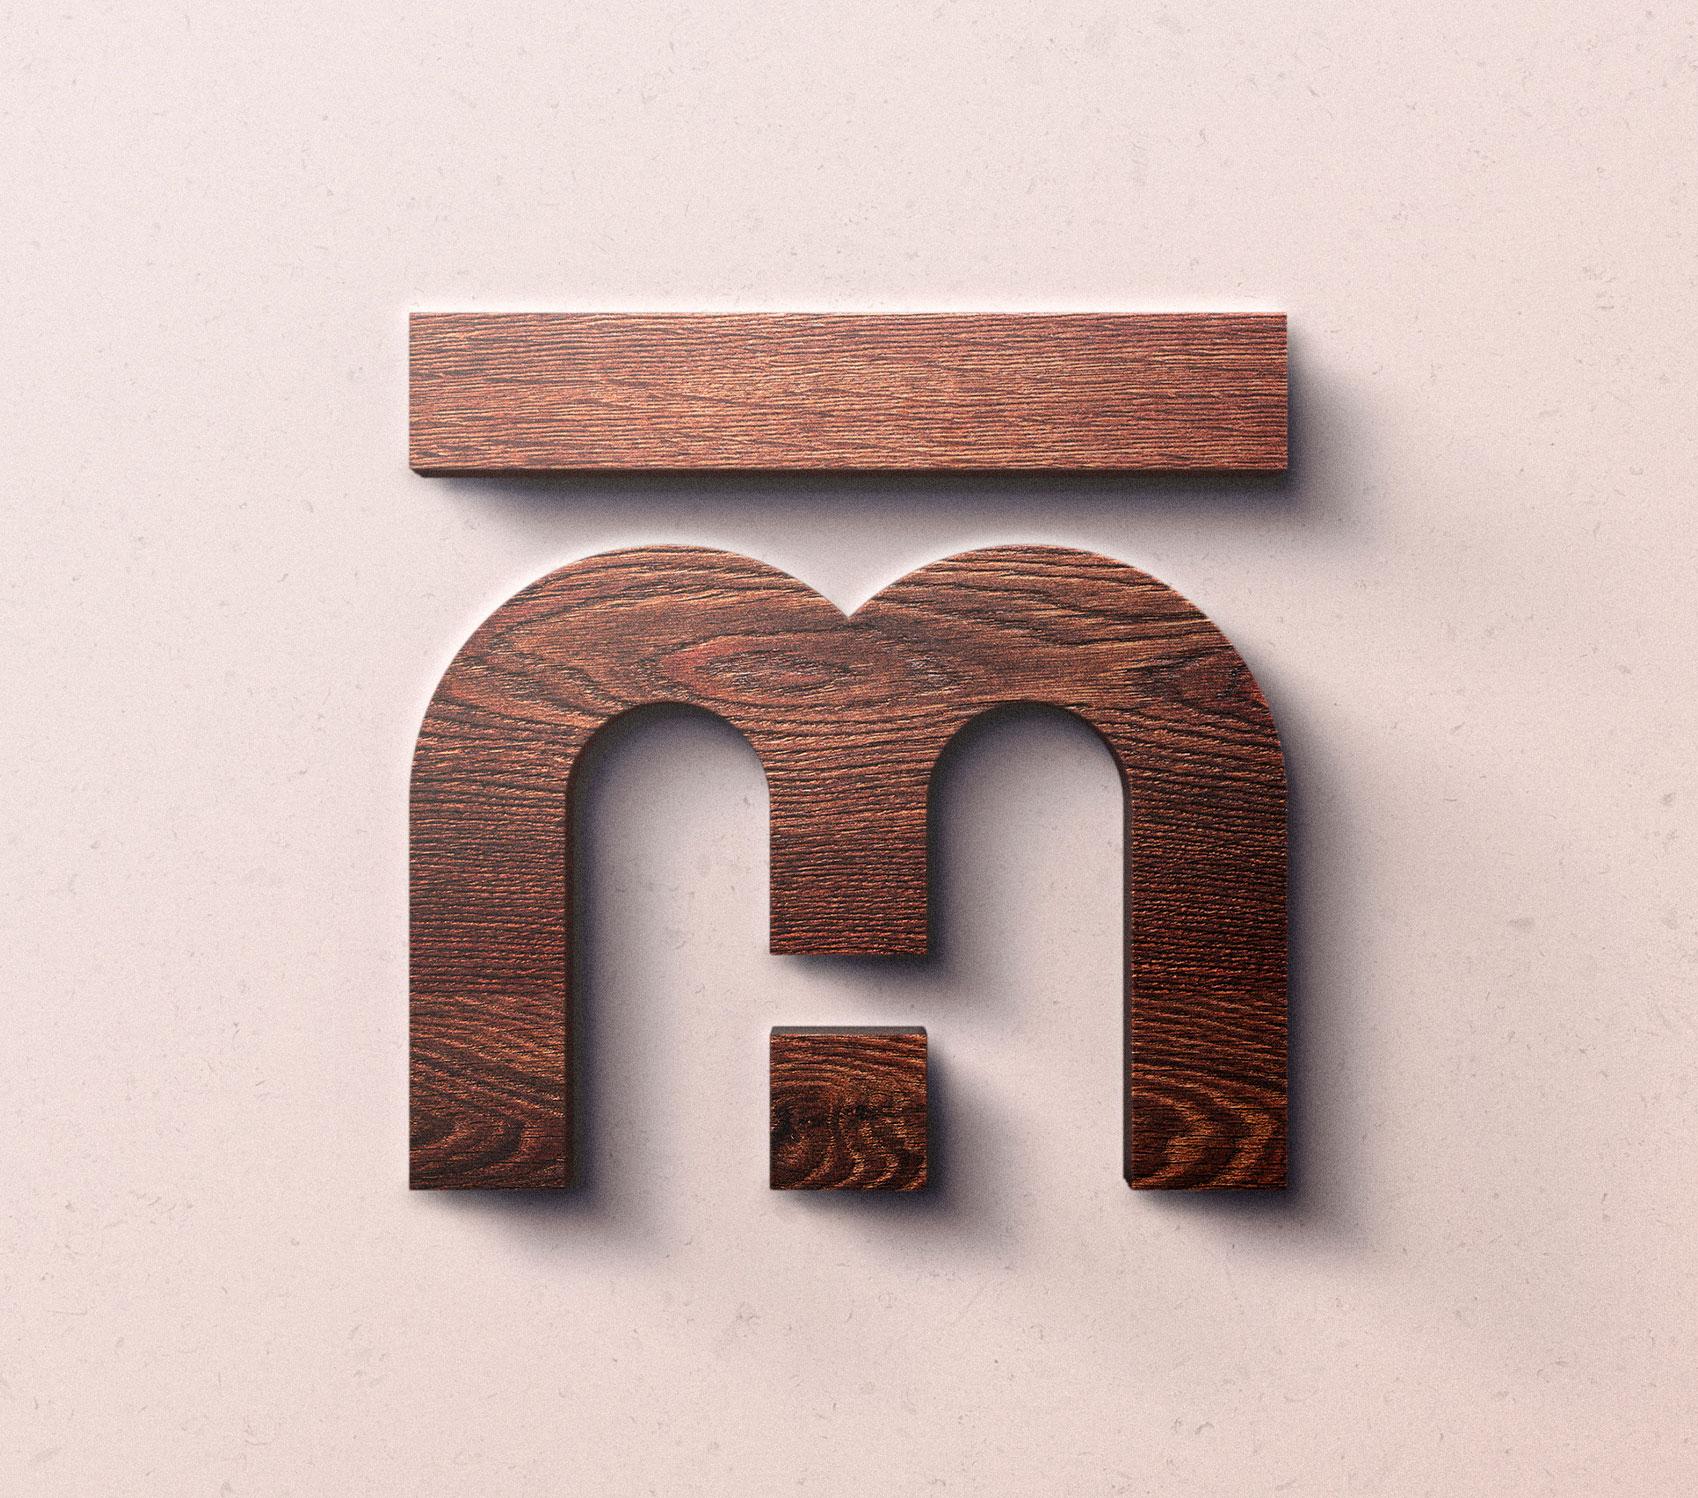 tre metri cubi logo